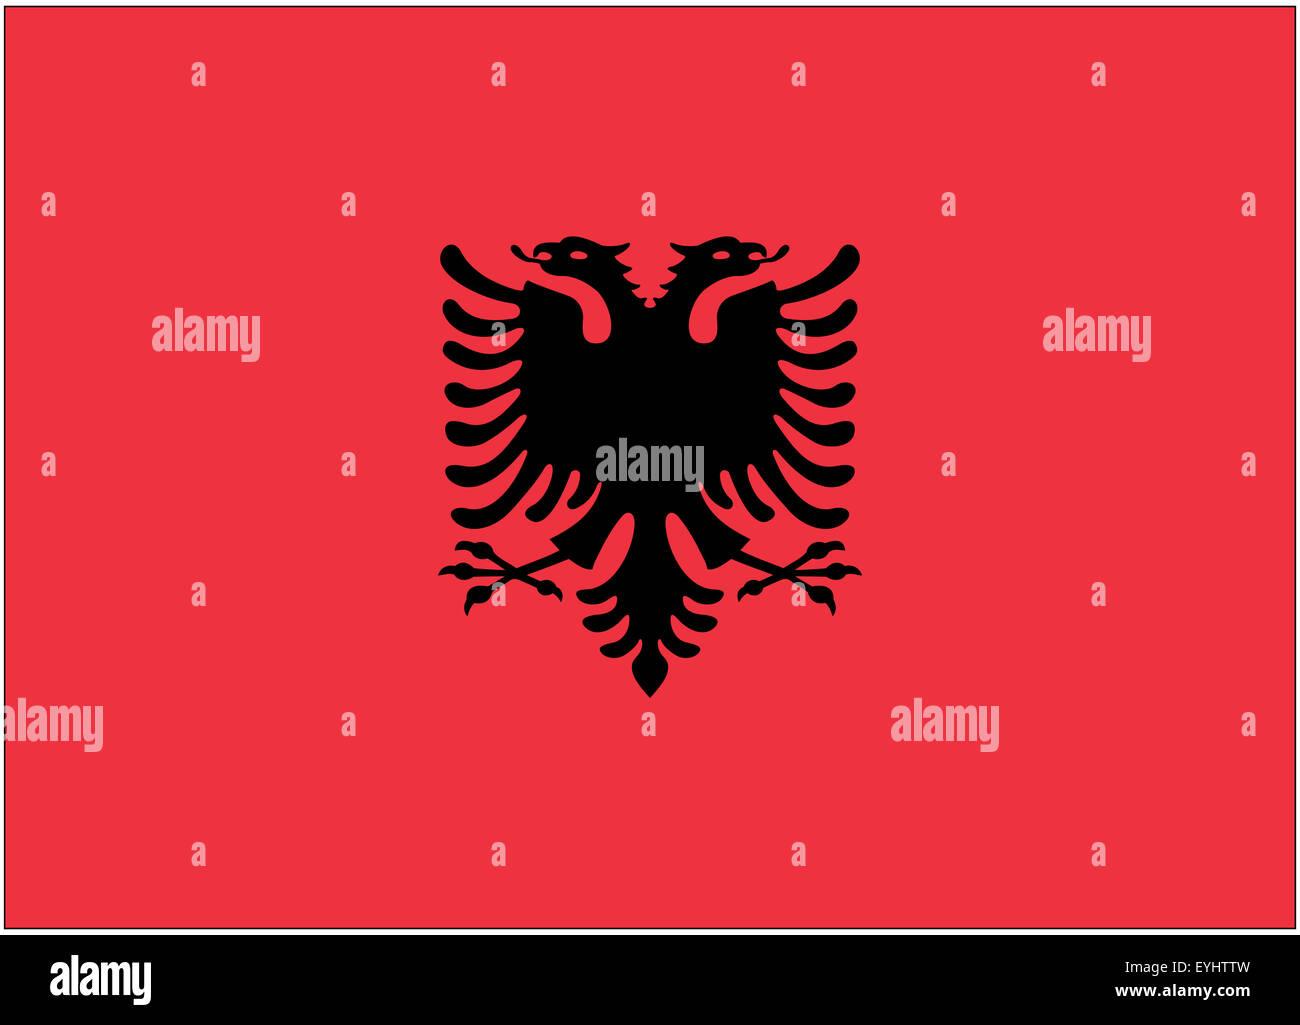 Fahne: Albanien/ flag: Albania. - Stock Image